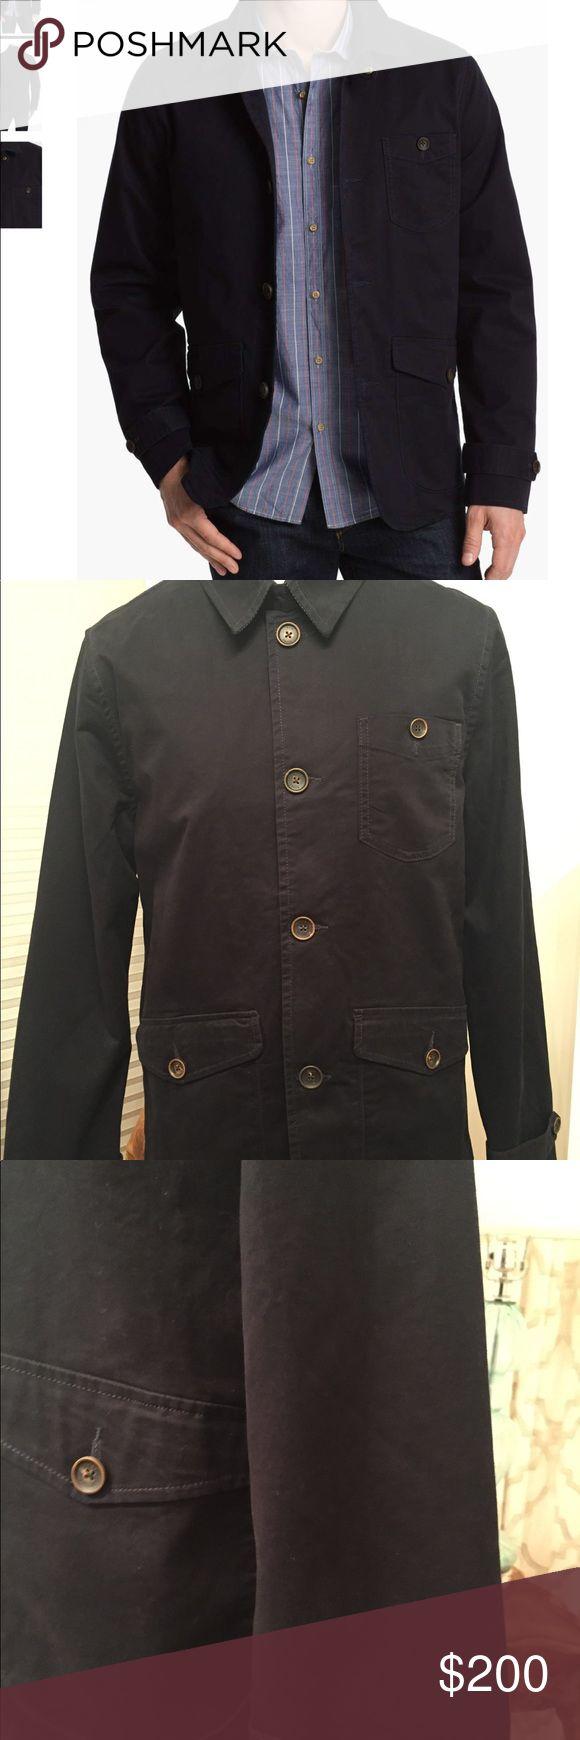 Men's Ted Baker Mclagen Jacket NWOT in new condition Men's Sportswear Ted Baker London Blue Jacket UK Size 4 US Conversion Size 40 Photo: Nordstrom.com Ted Baker London Jackets & Coats